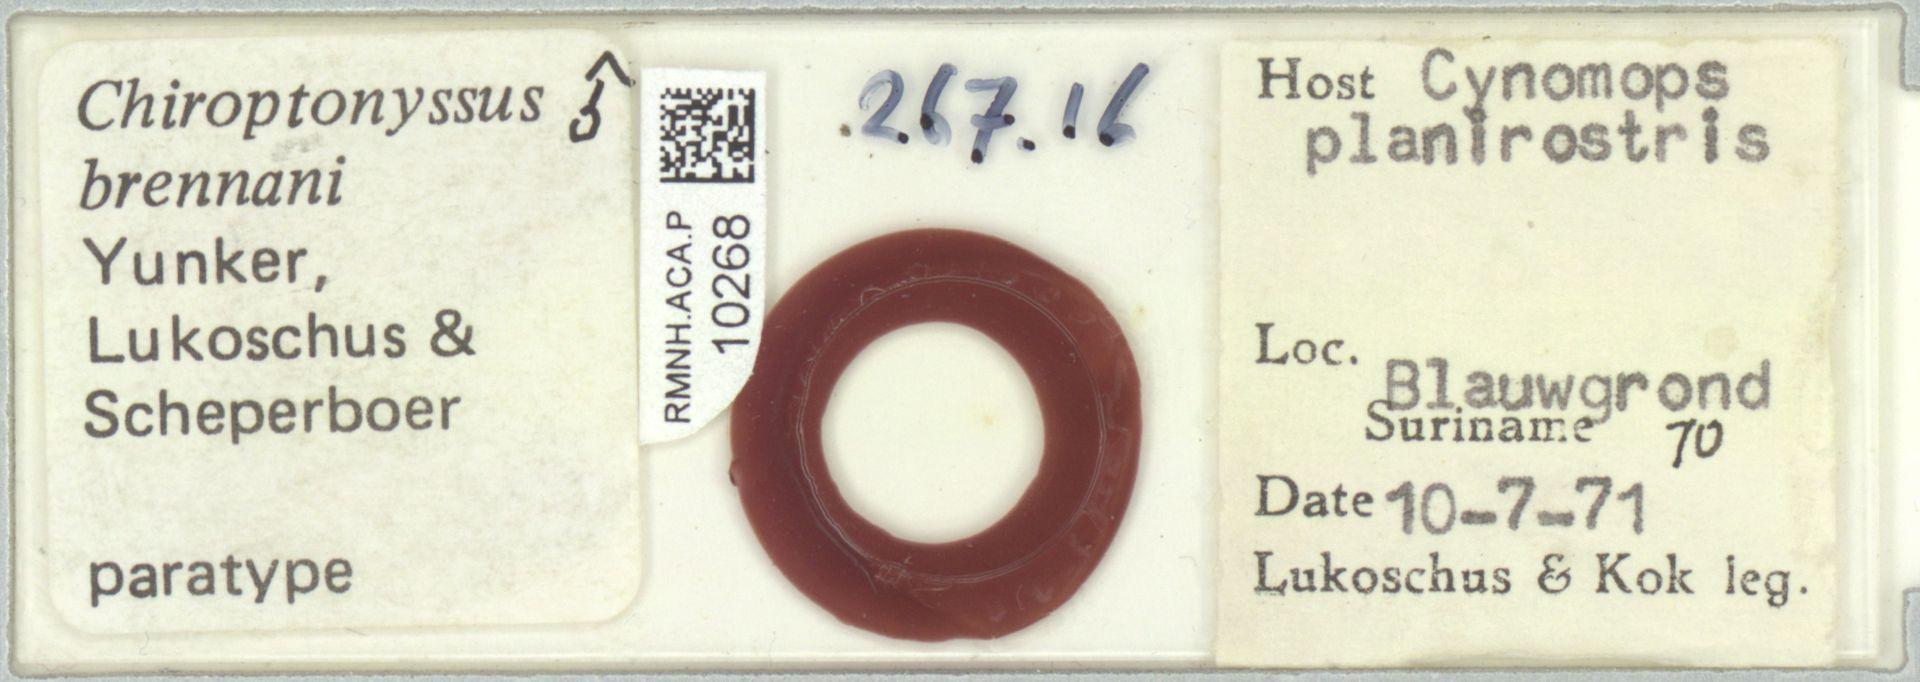 RMNH.ACA.P.10268   Chiroptonyssus brennani Yunker, Lukoschus & Scheperboer